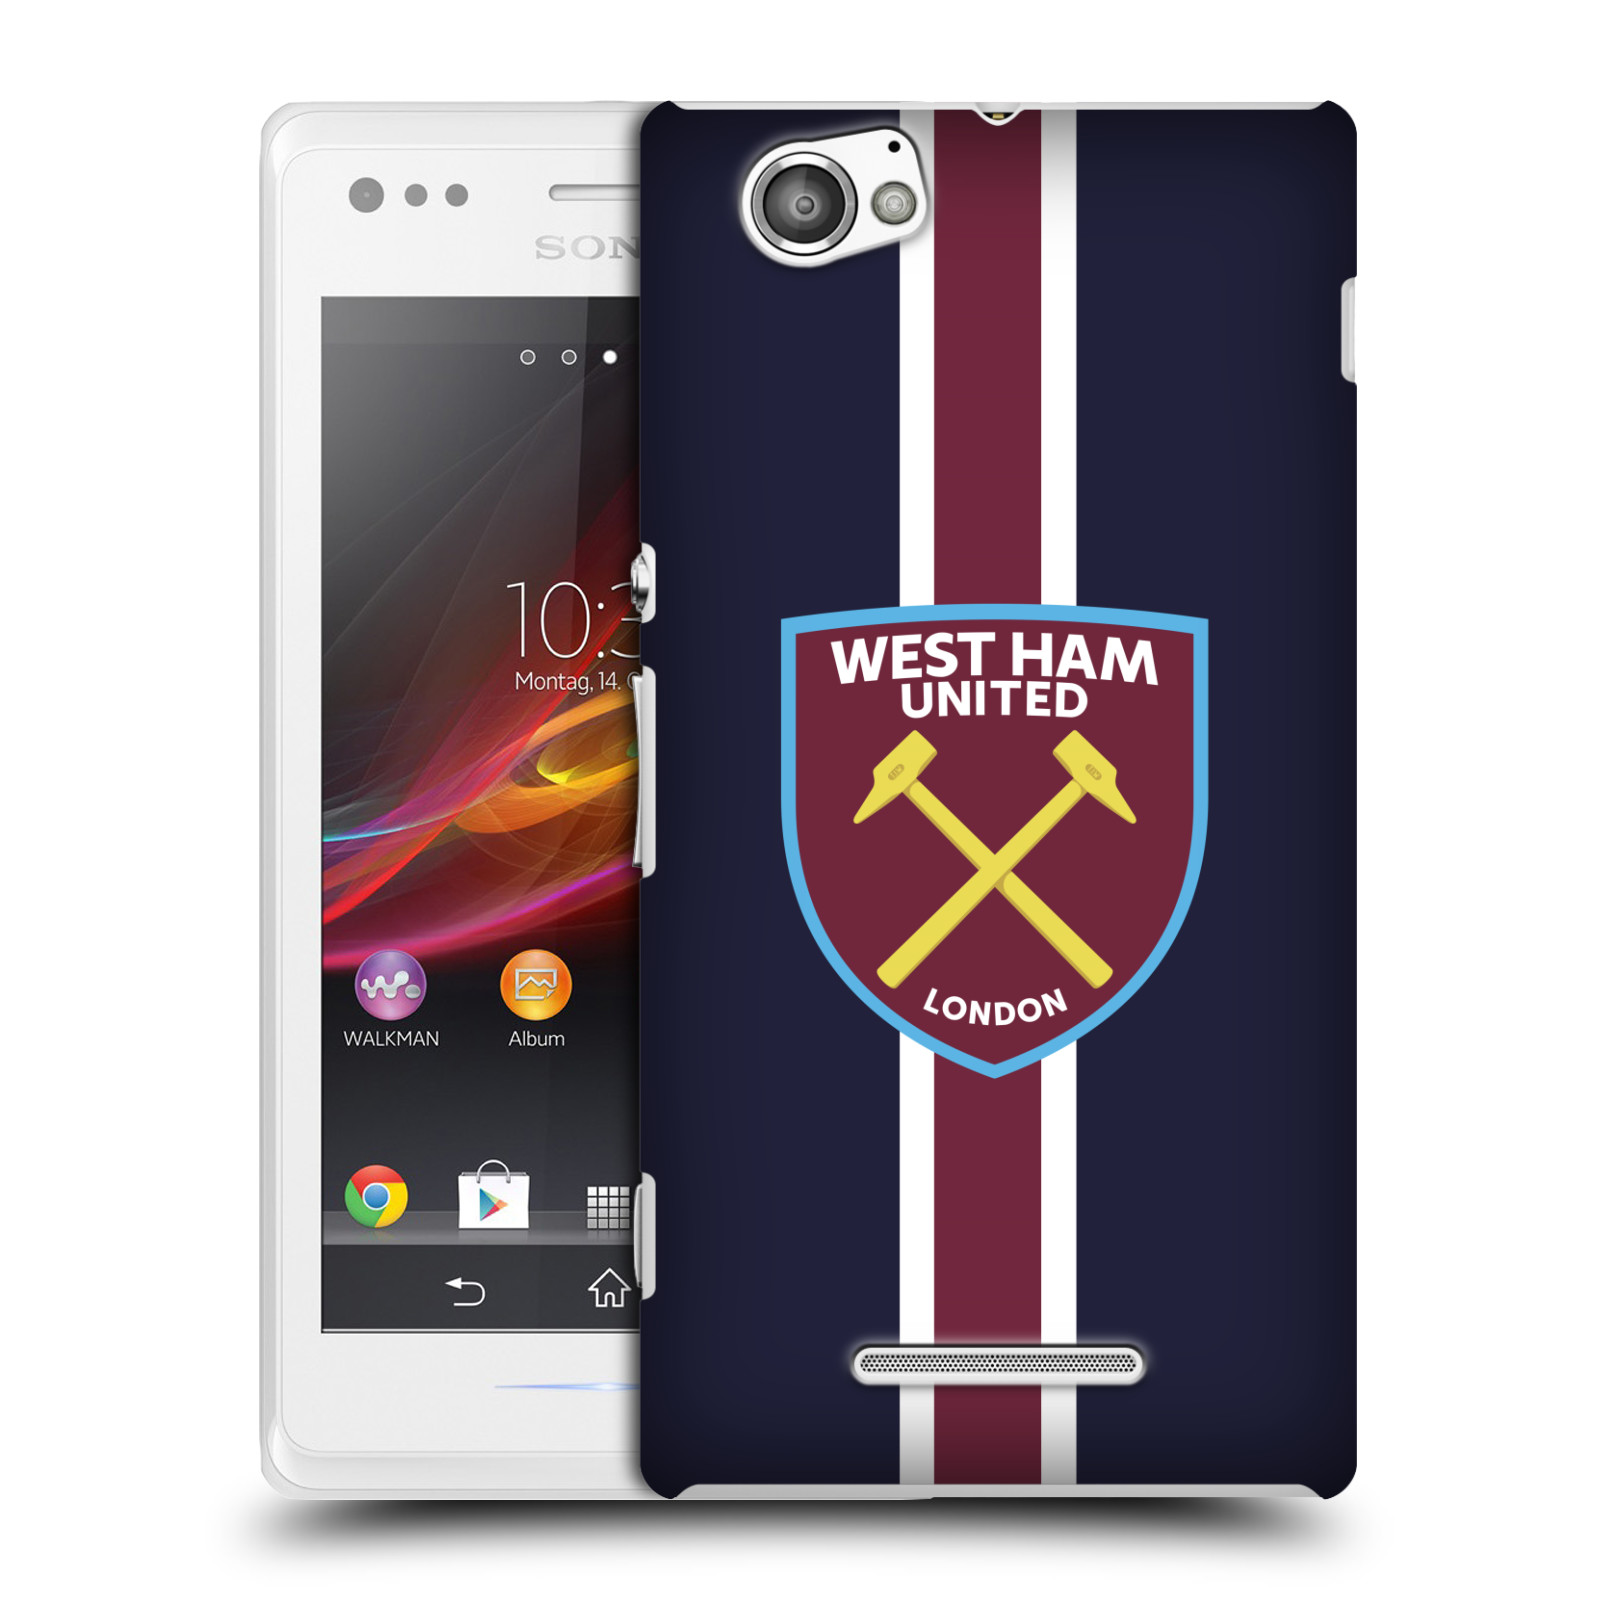 Plastové pouzdro na mobil Sony Xperia M C1905 - Head Case - West Ham United - Pruhy